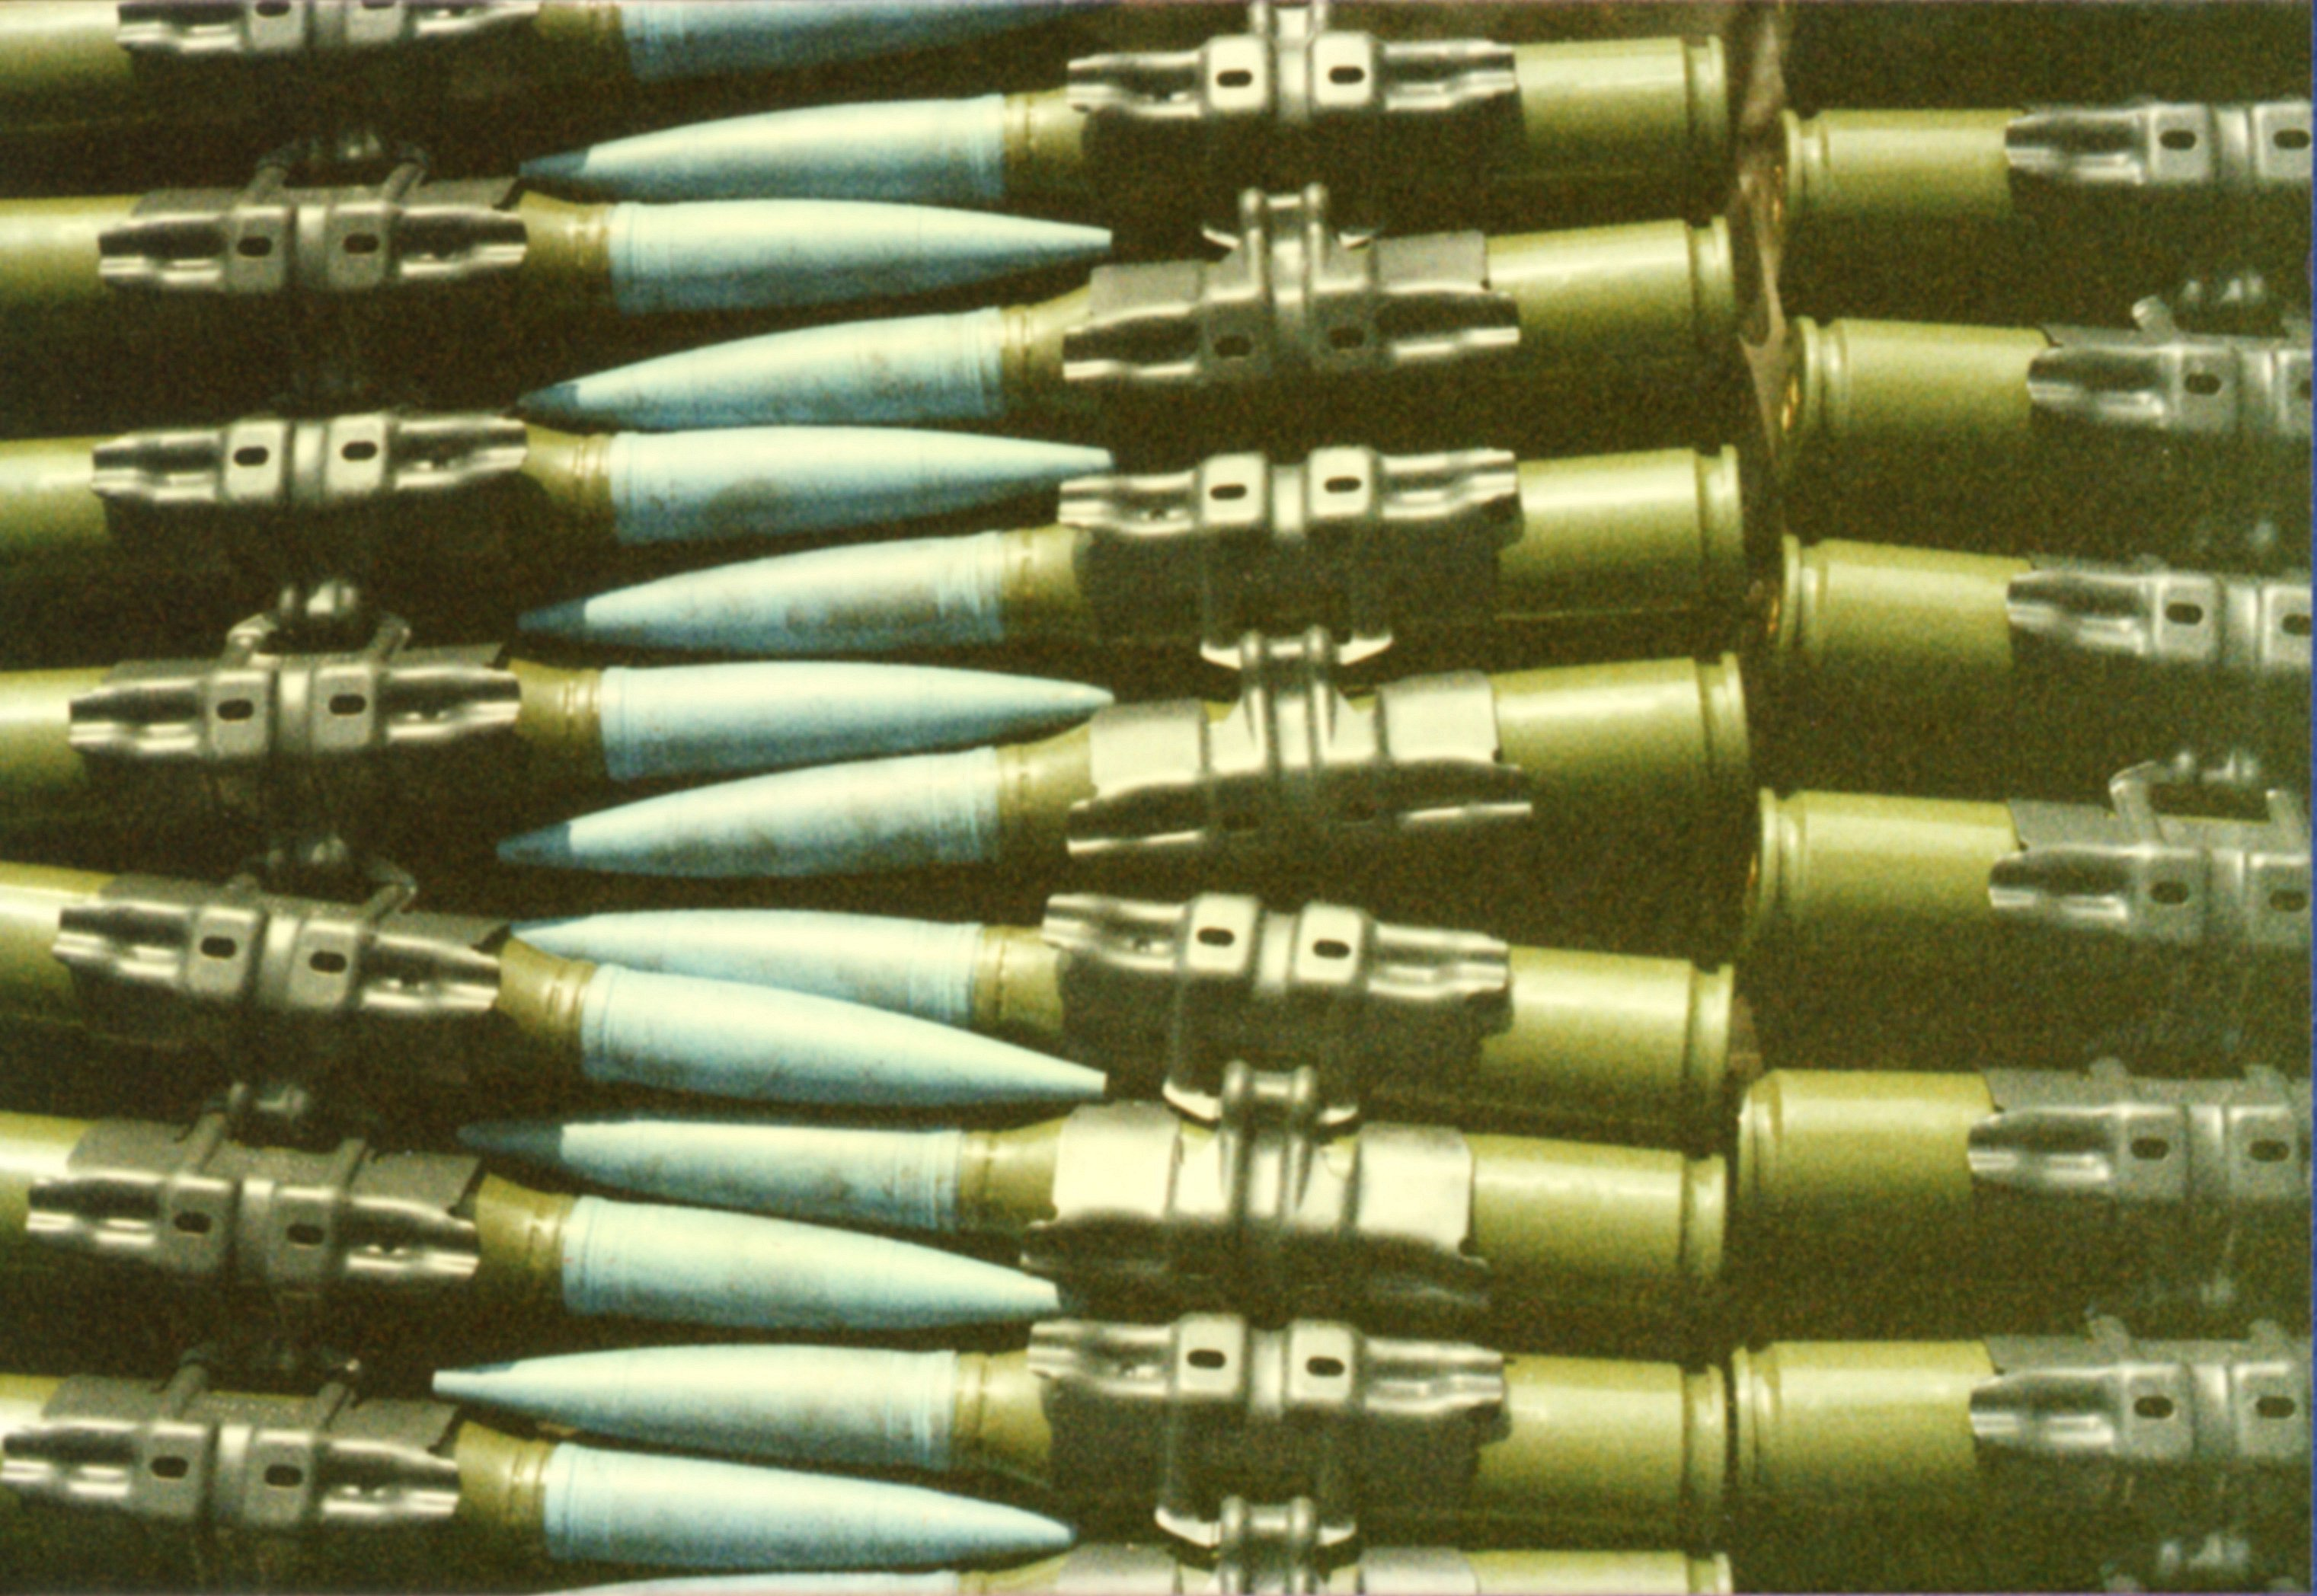 FLAK-Panzer_Gepard_35mm_Übungs-Munition_1987_Todendorf.jpg